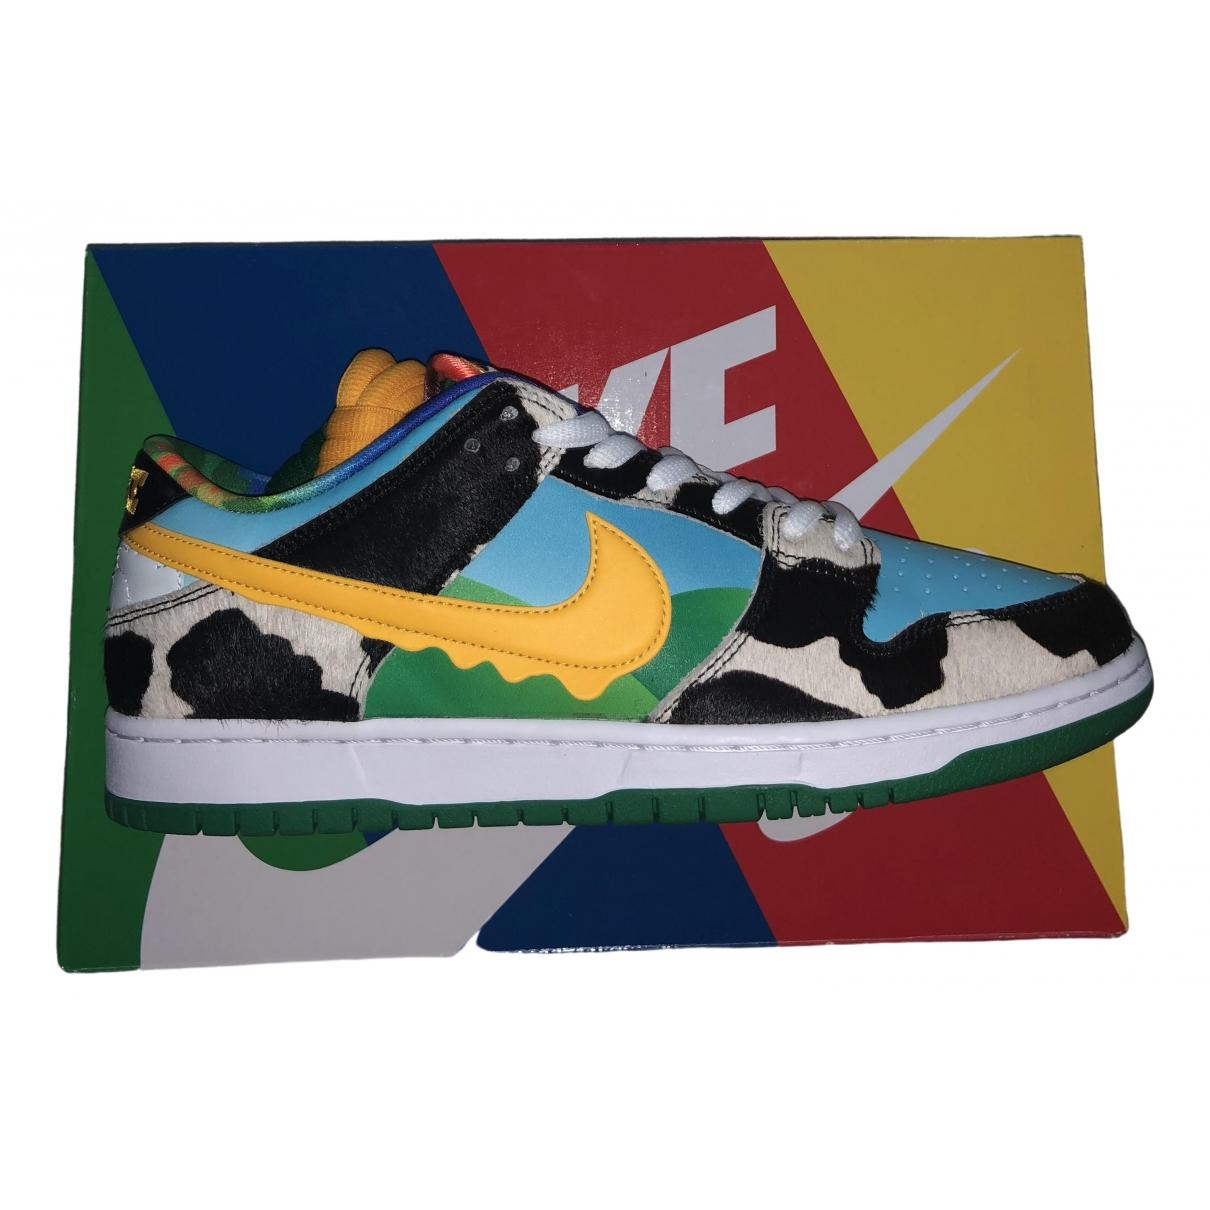 Nike SB Dunk  Sneakers in  Bunt Leder